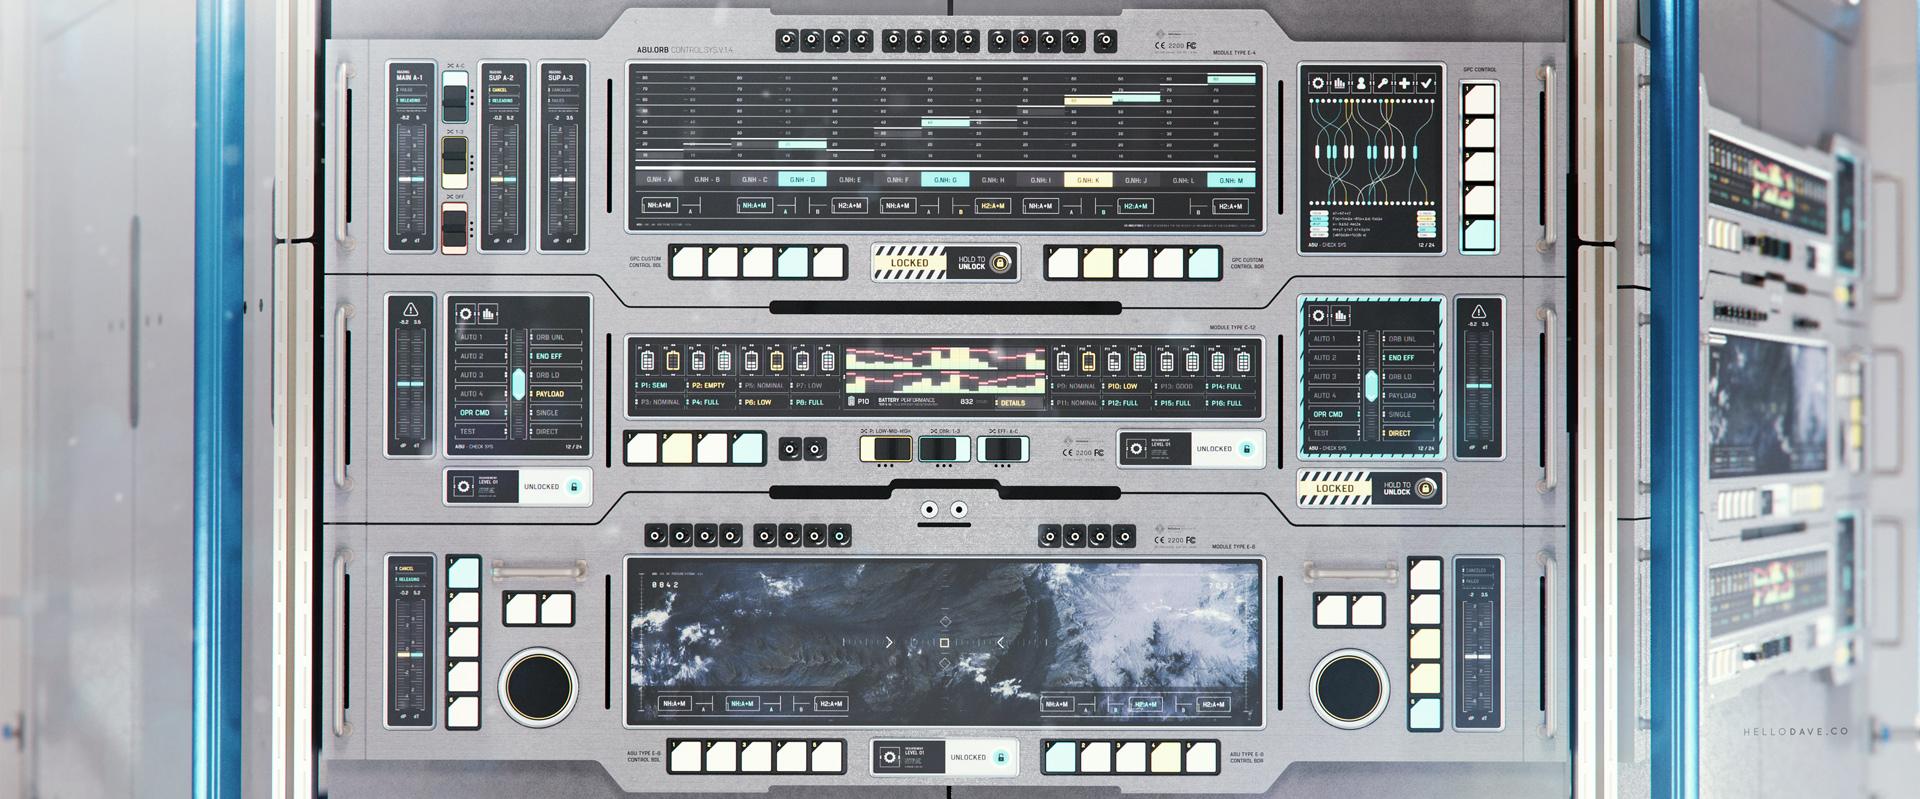 SpaceStation_hardwareTests_07_1920px